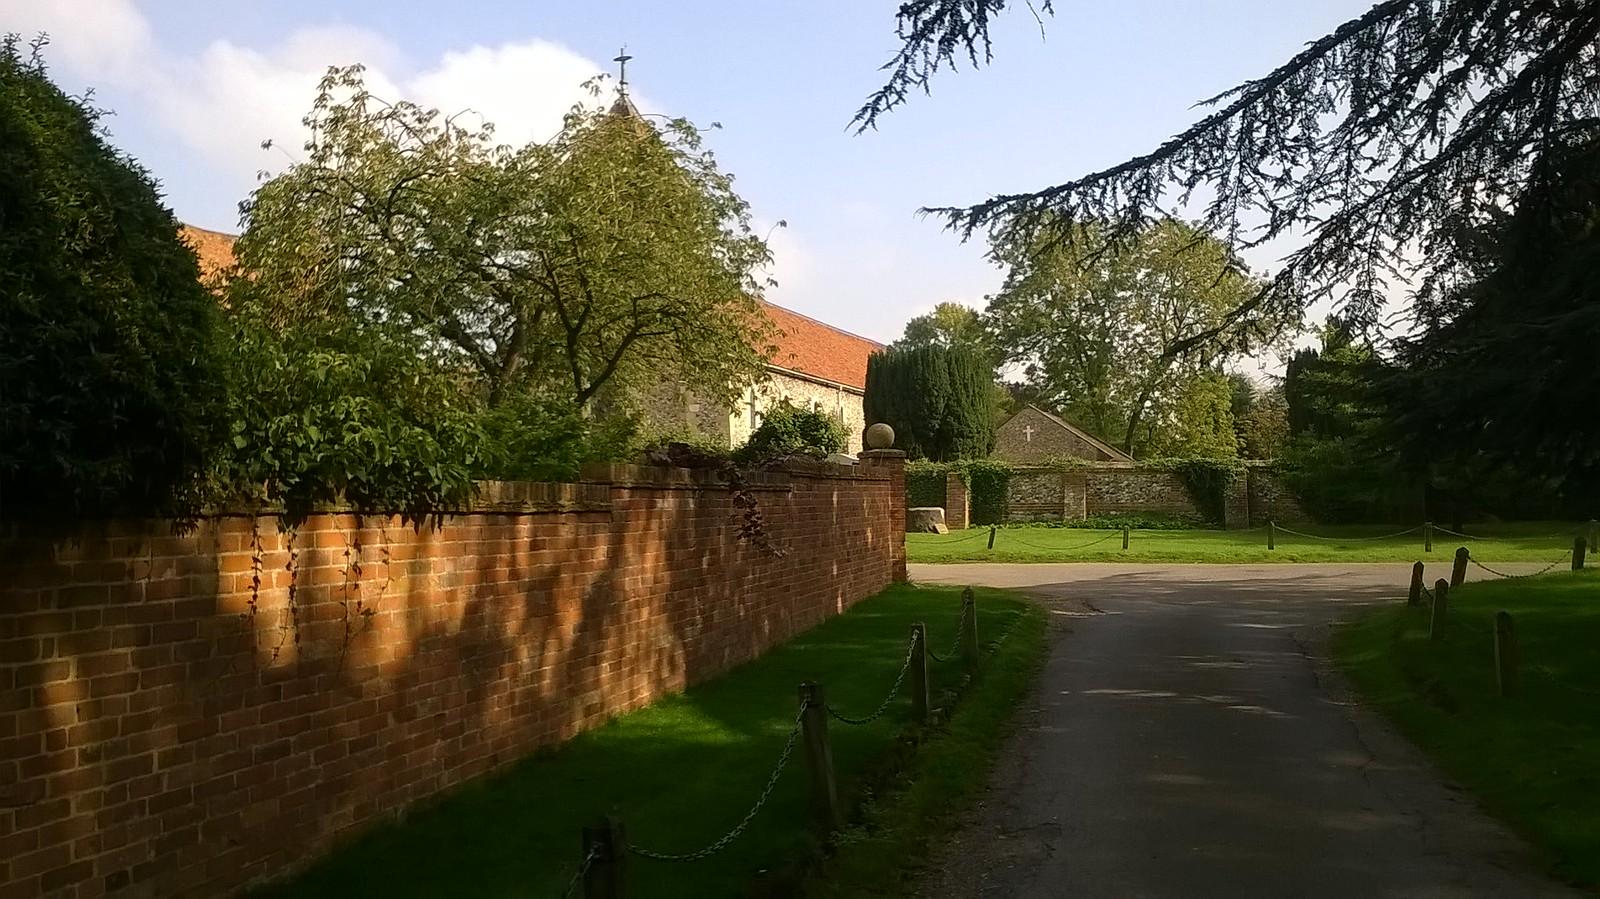 Village scene Hurley